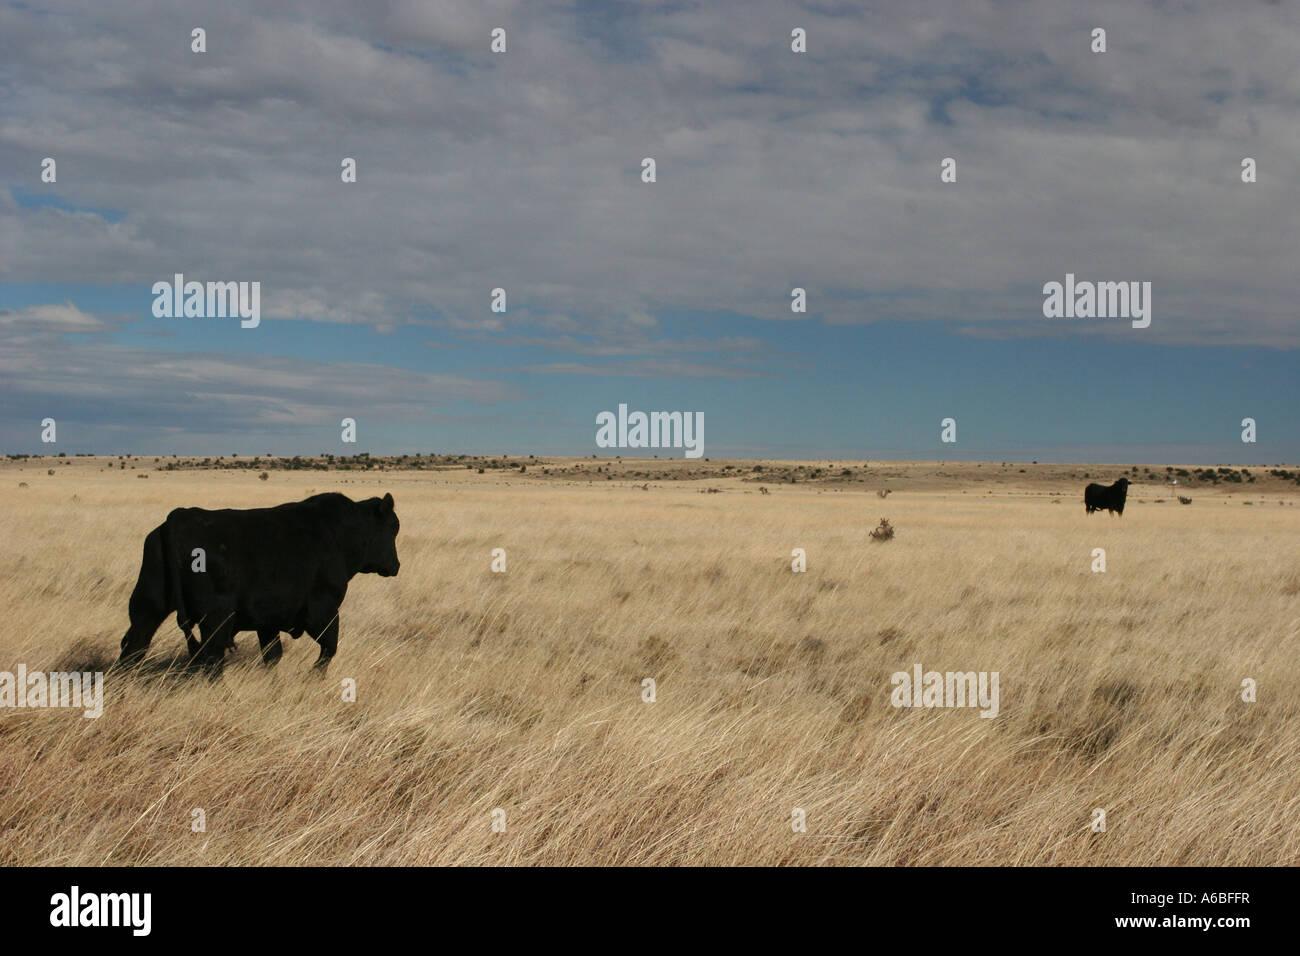 Bulls in hayfield Oklahoma, USA - Stock Image